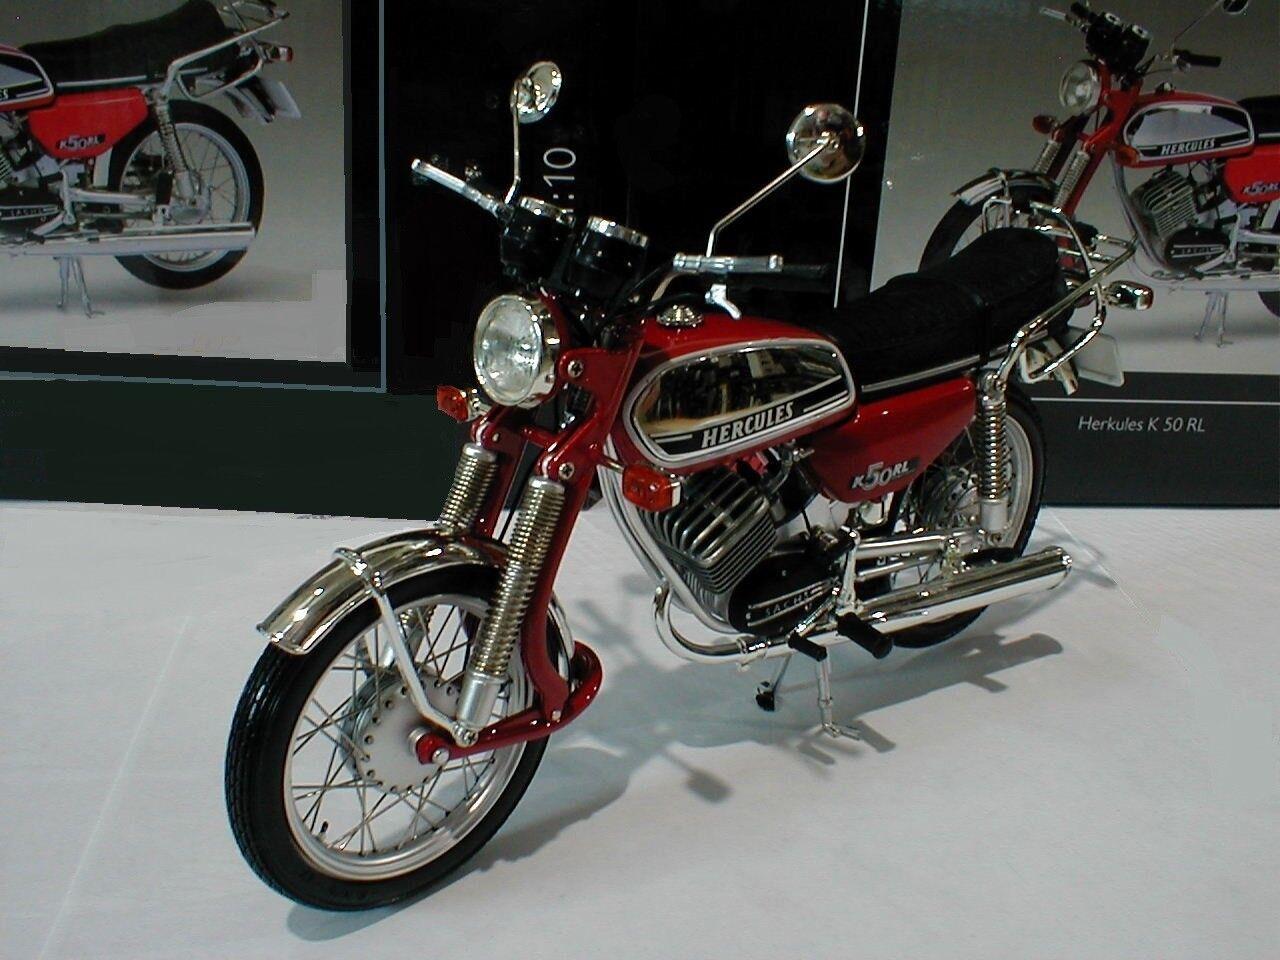 SCHUCO 1 10 MOTO HERCULES K50 RL CHROME et ROUGE ref 450664900